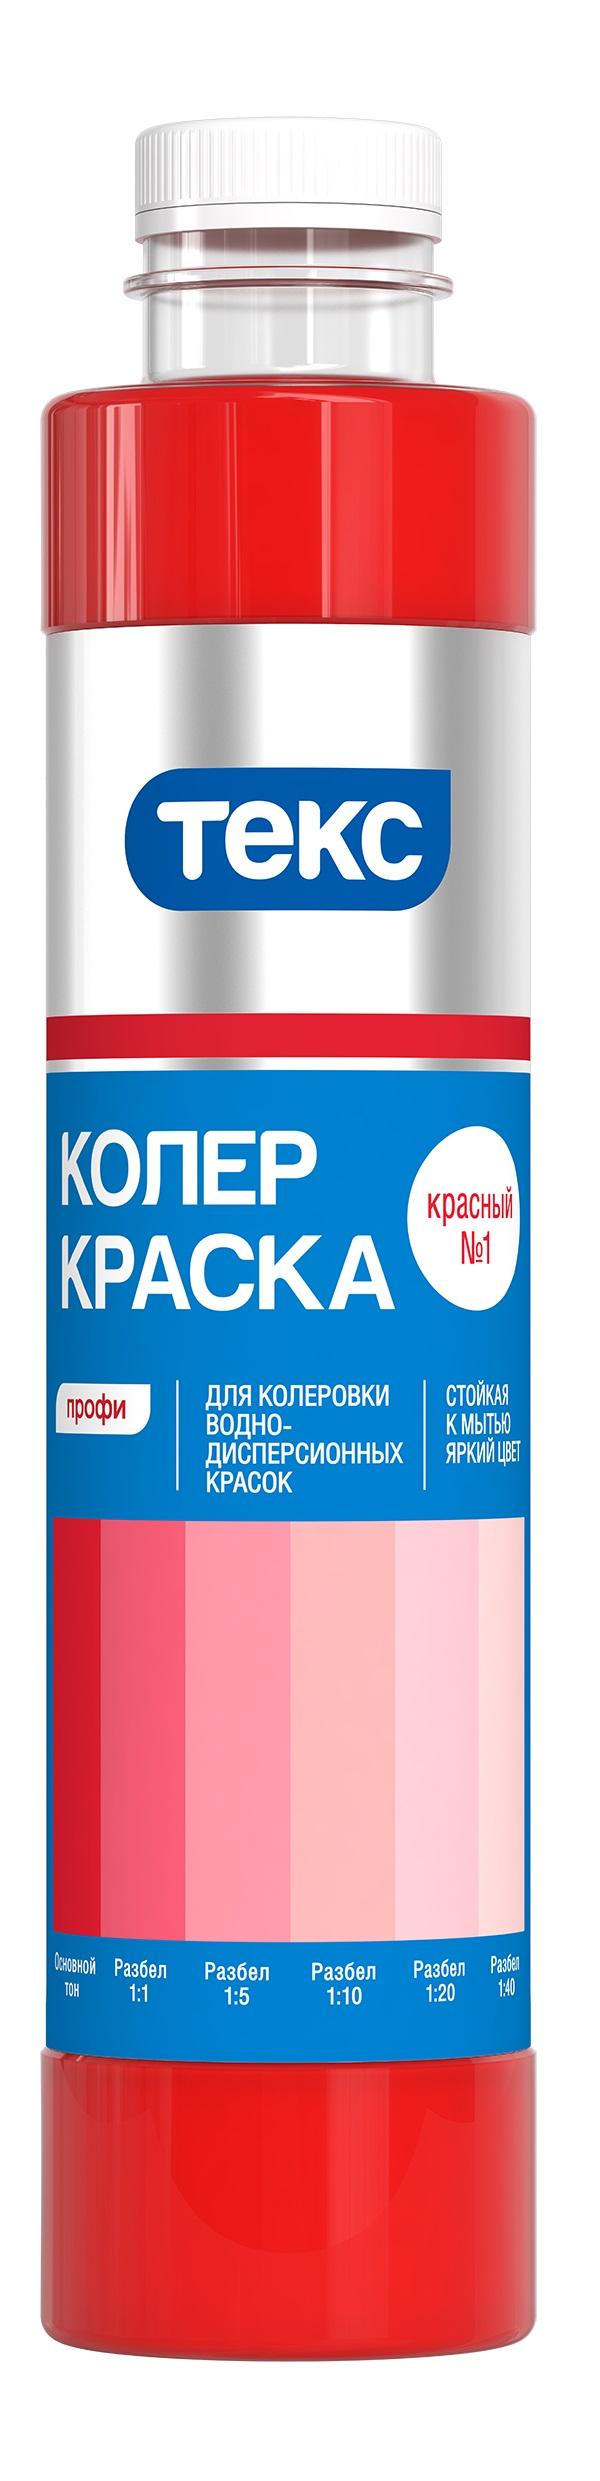 Колер краска красная №1 Текс 0,75 л